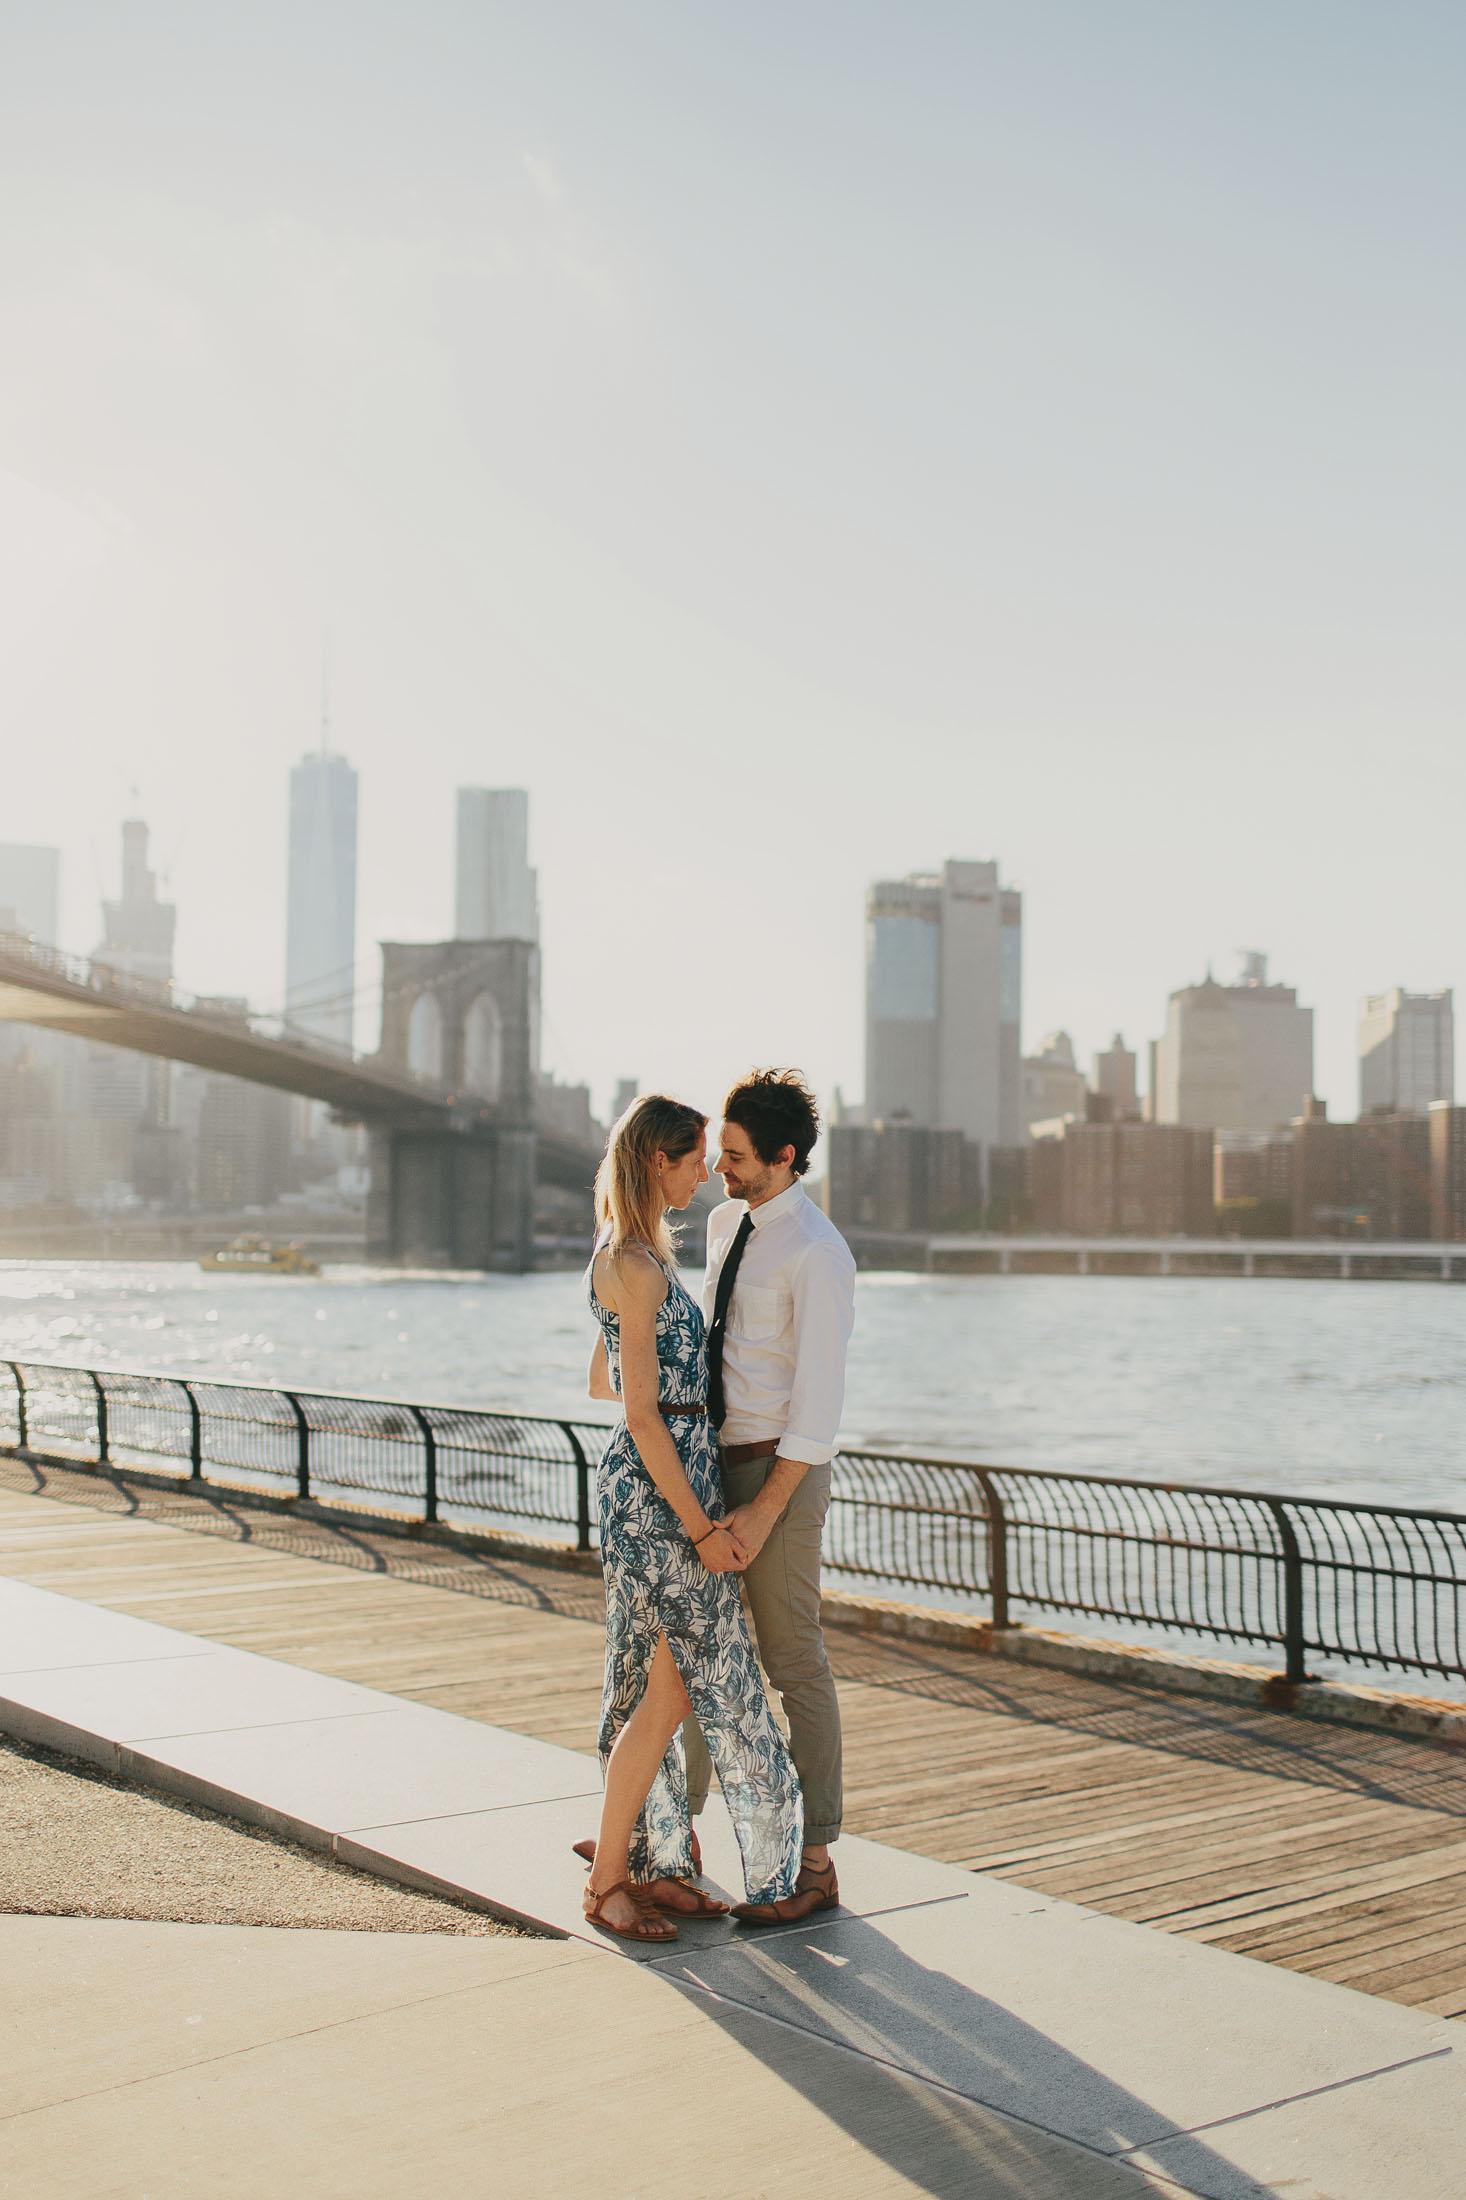 34 finch and oak engagement wedding photographer gold coast new york brooklyn.jpg